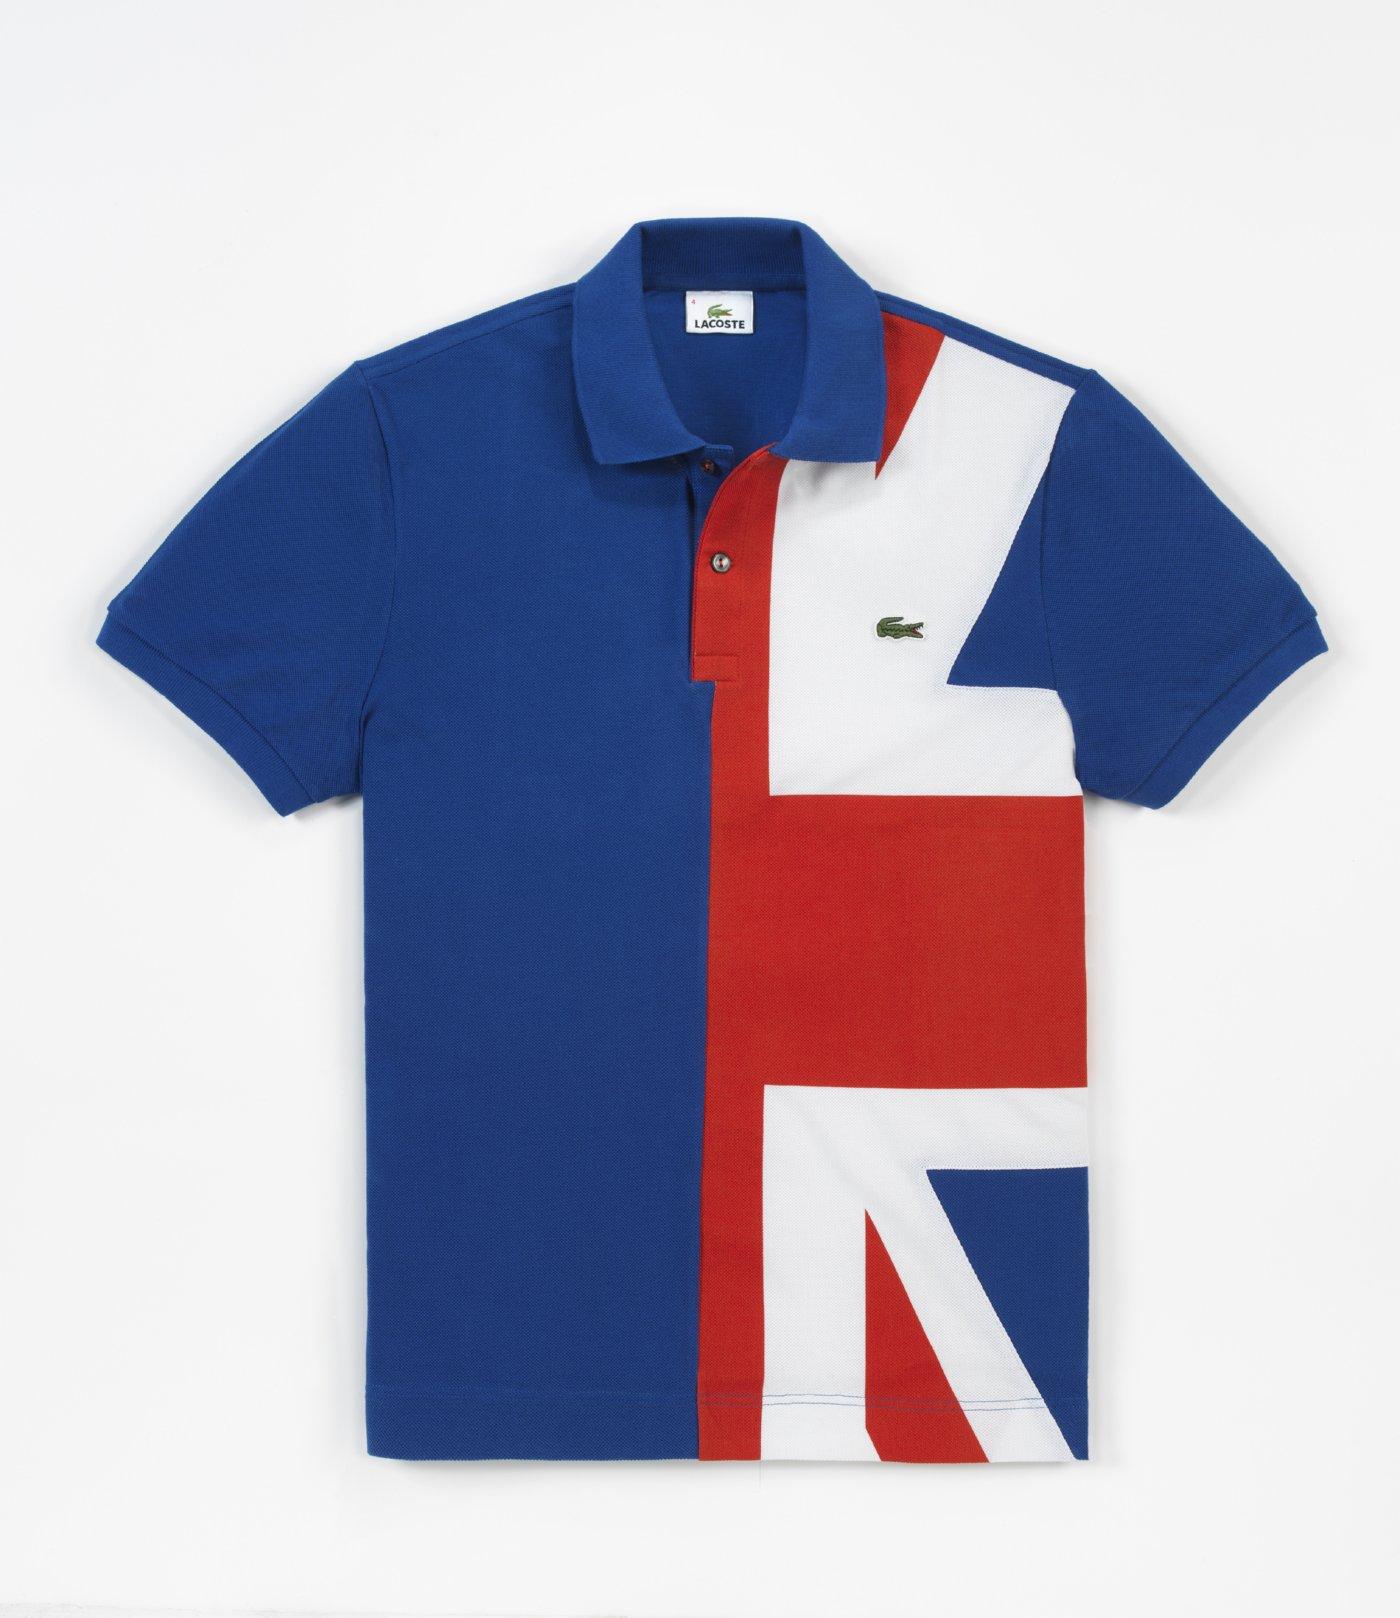 lacoste_flag_polo_shirt_-_great_britain.jpg